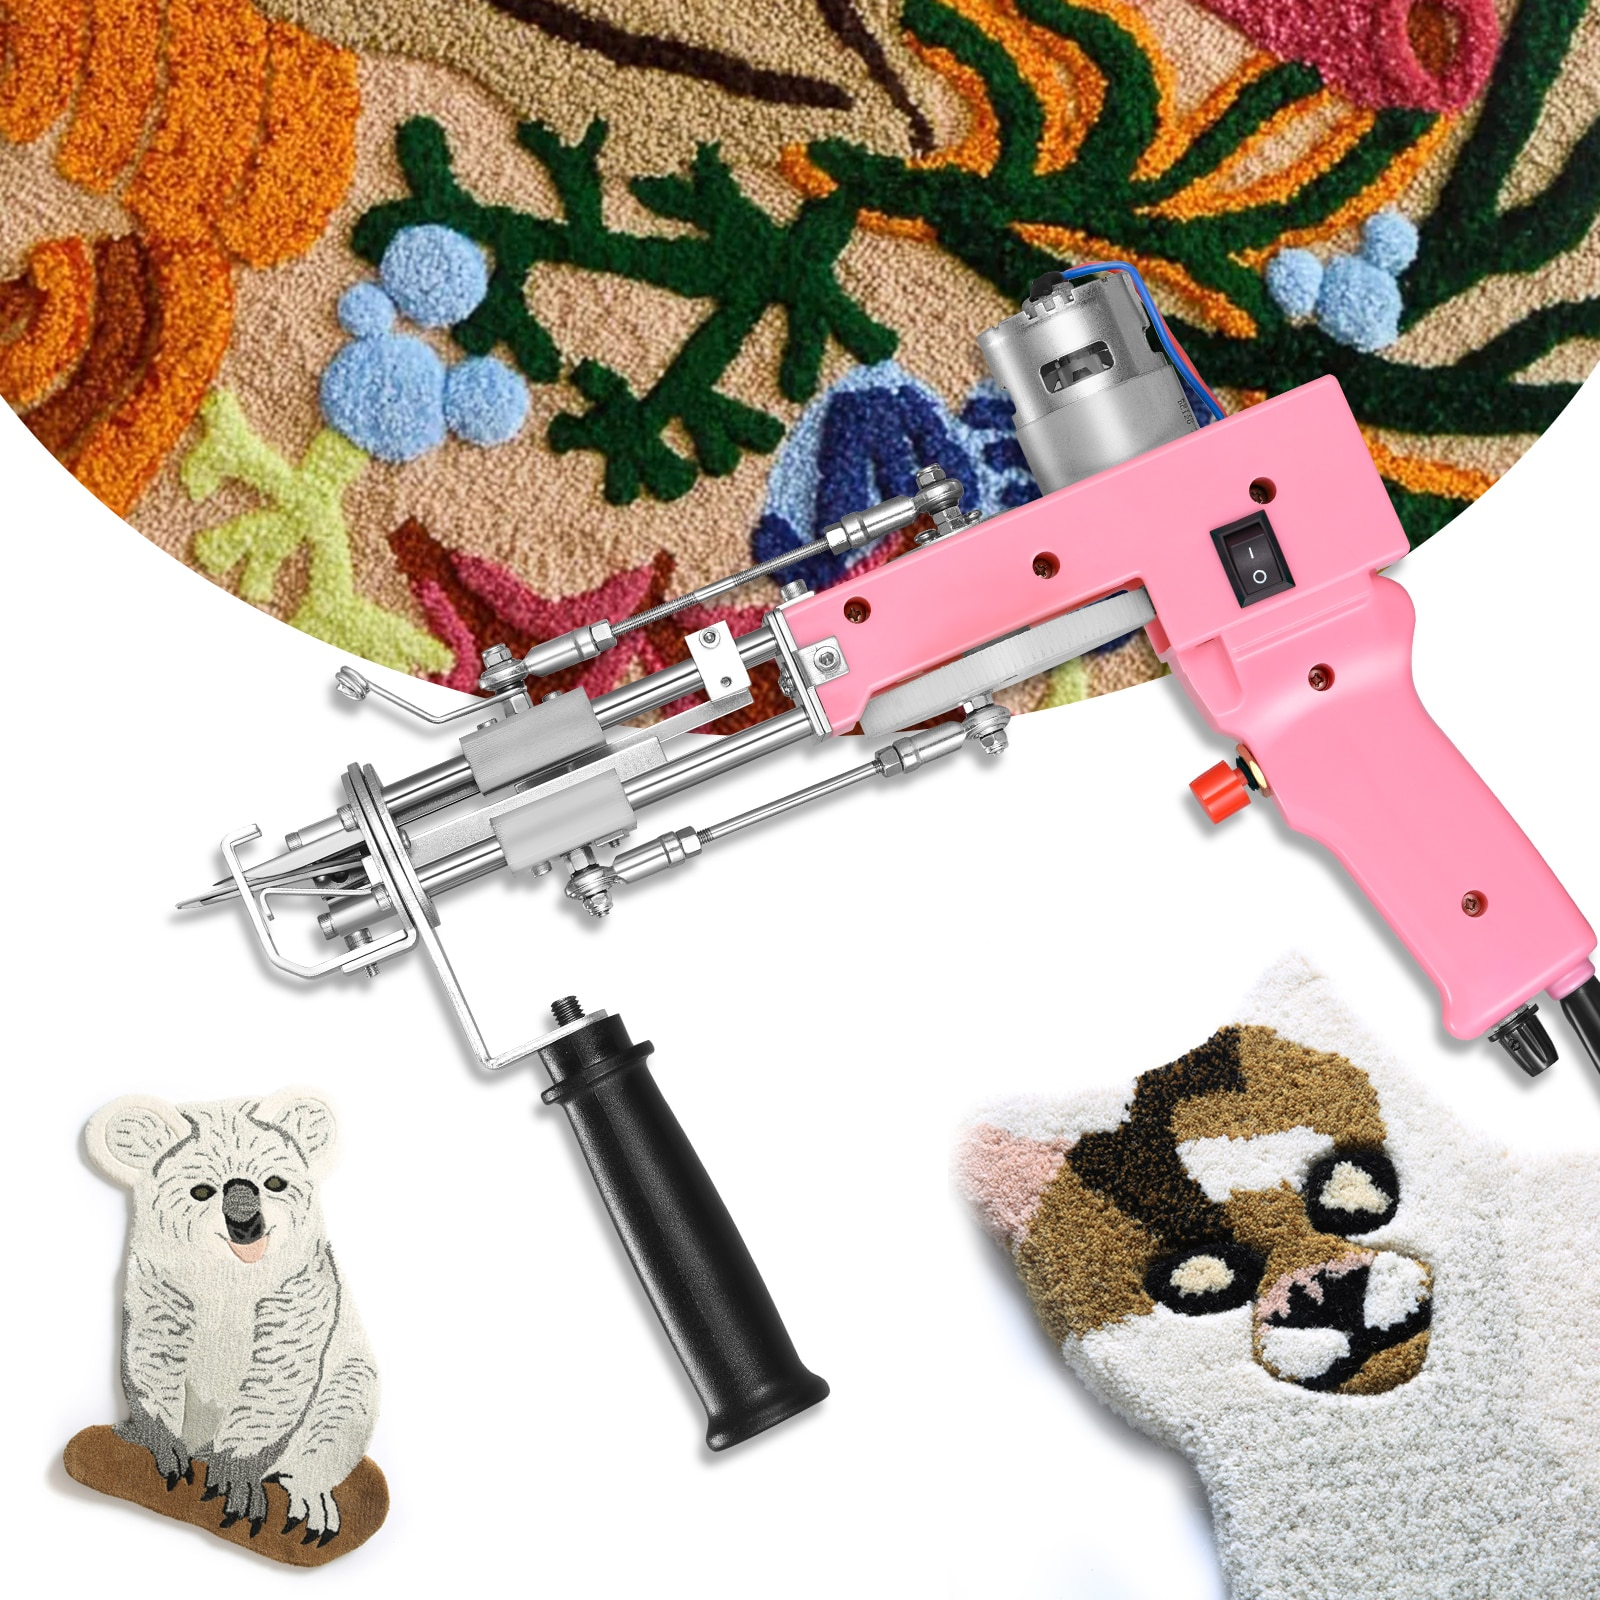 Cut Pile And Loop Pile 2 In 1 Tufting Gun Electric Carpet Rug Guns Carpet Weaving Knitting Machine DIY Carpet Supplies Cut/Loop enlarge